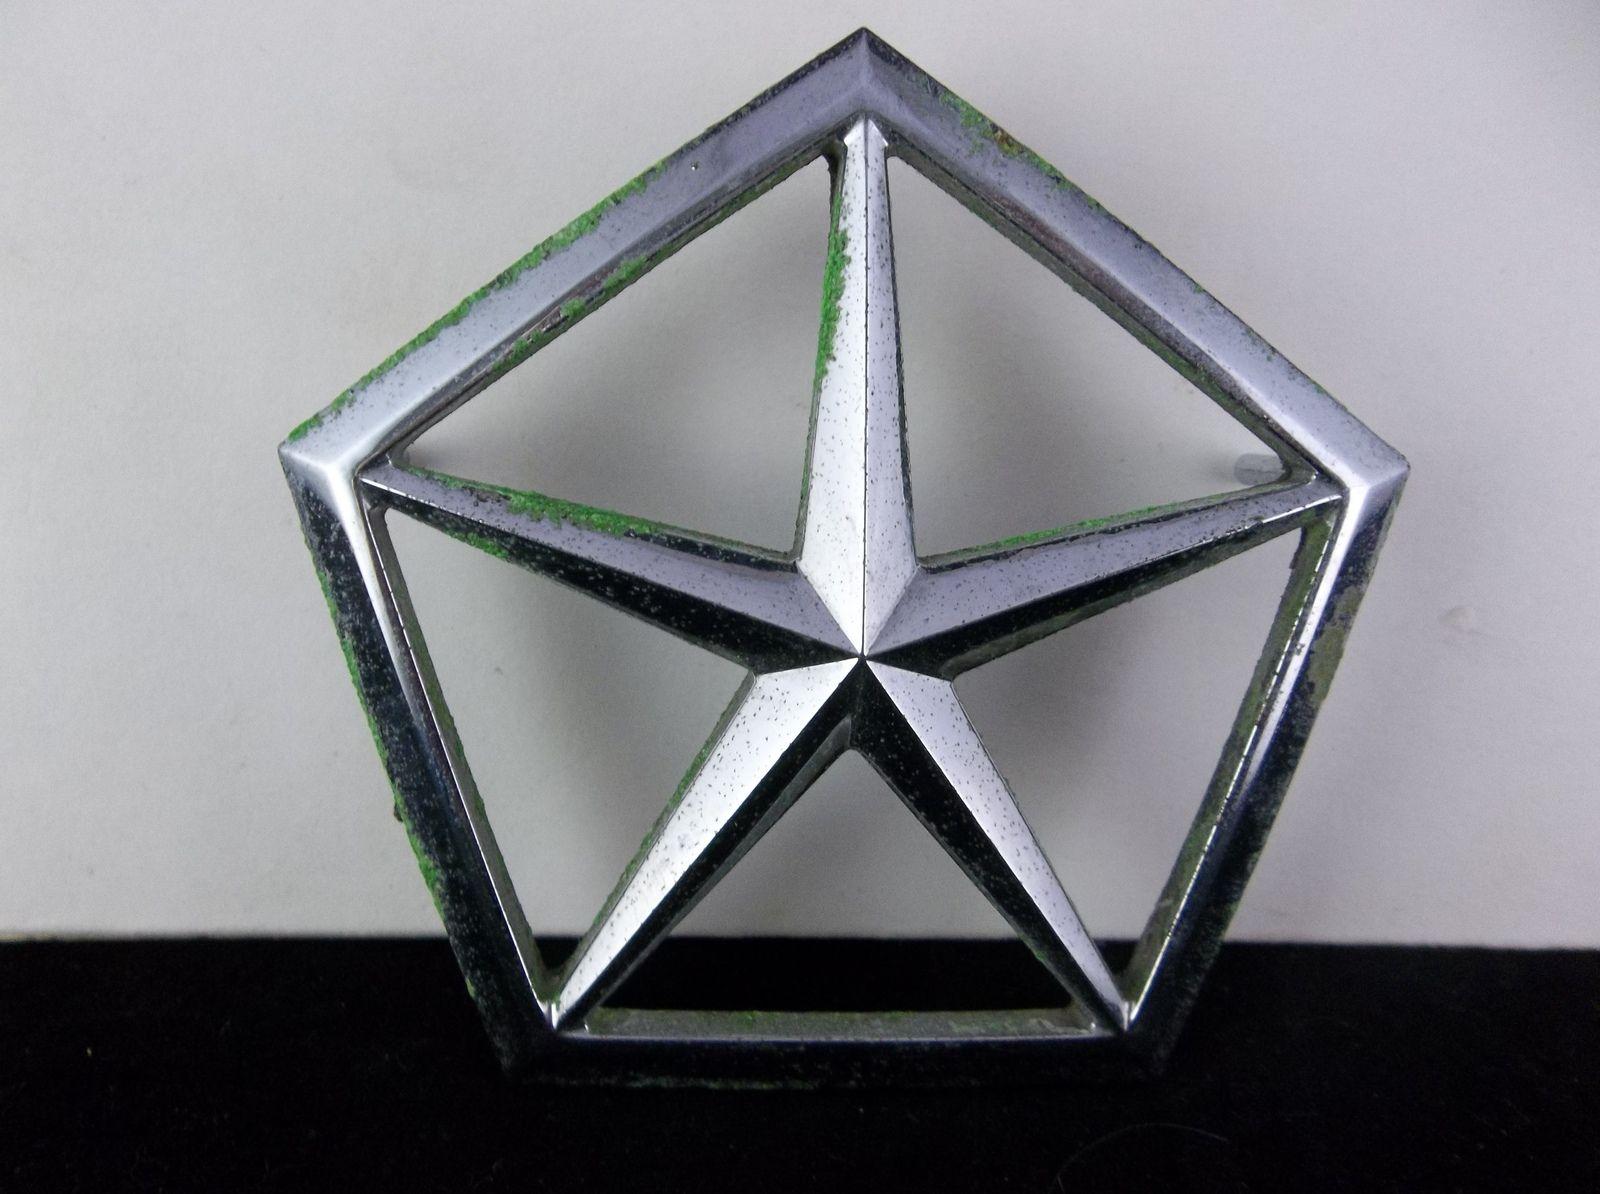 19871993 Chrysler Lebaron Pentastar Trunk Emblem OEM